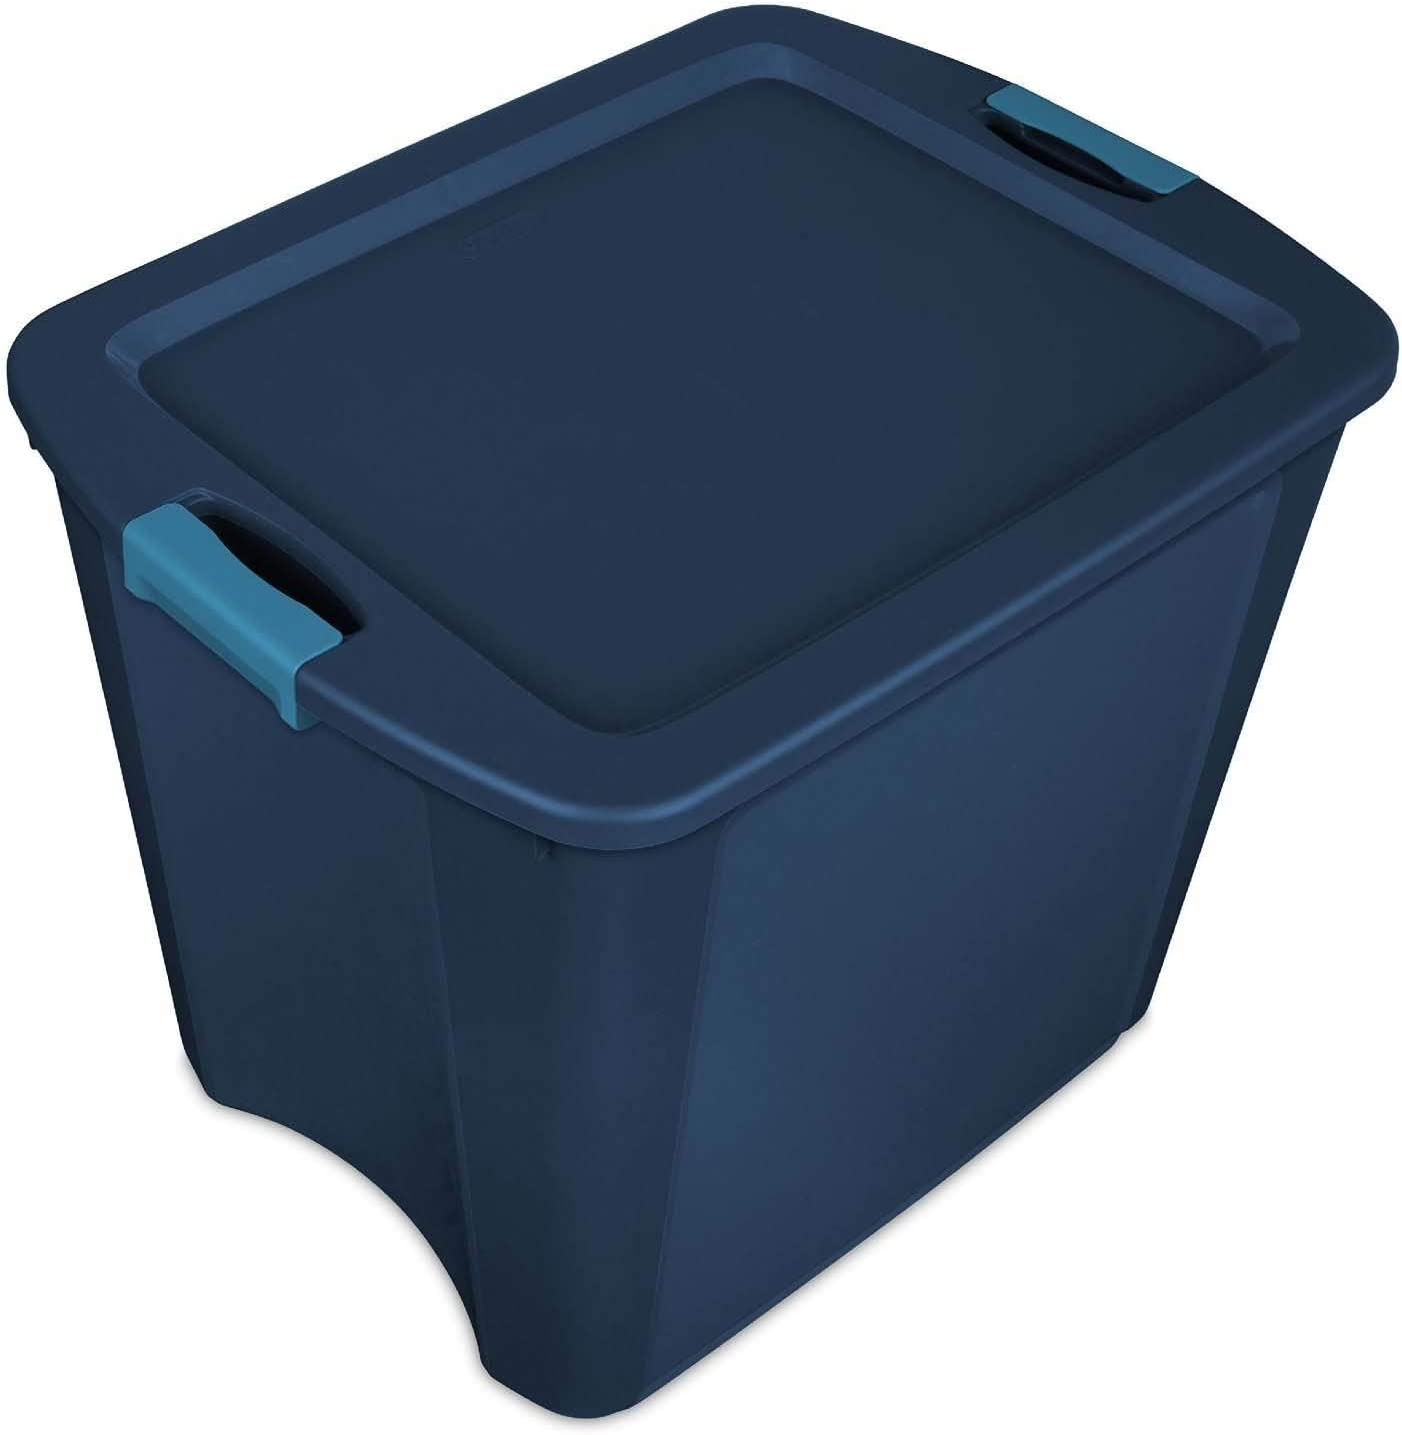 Sterilite 26 Gallon Latch and Carry Storage 14 quality assurance Blue Tote trust True